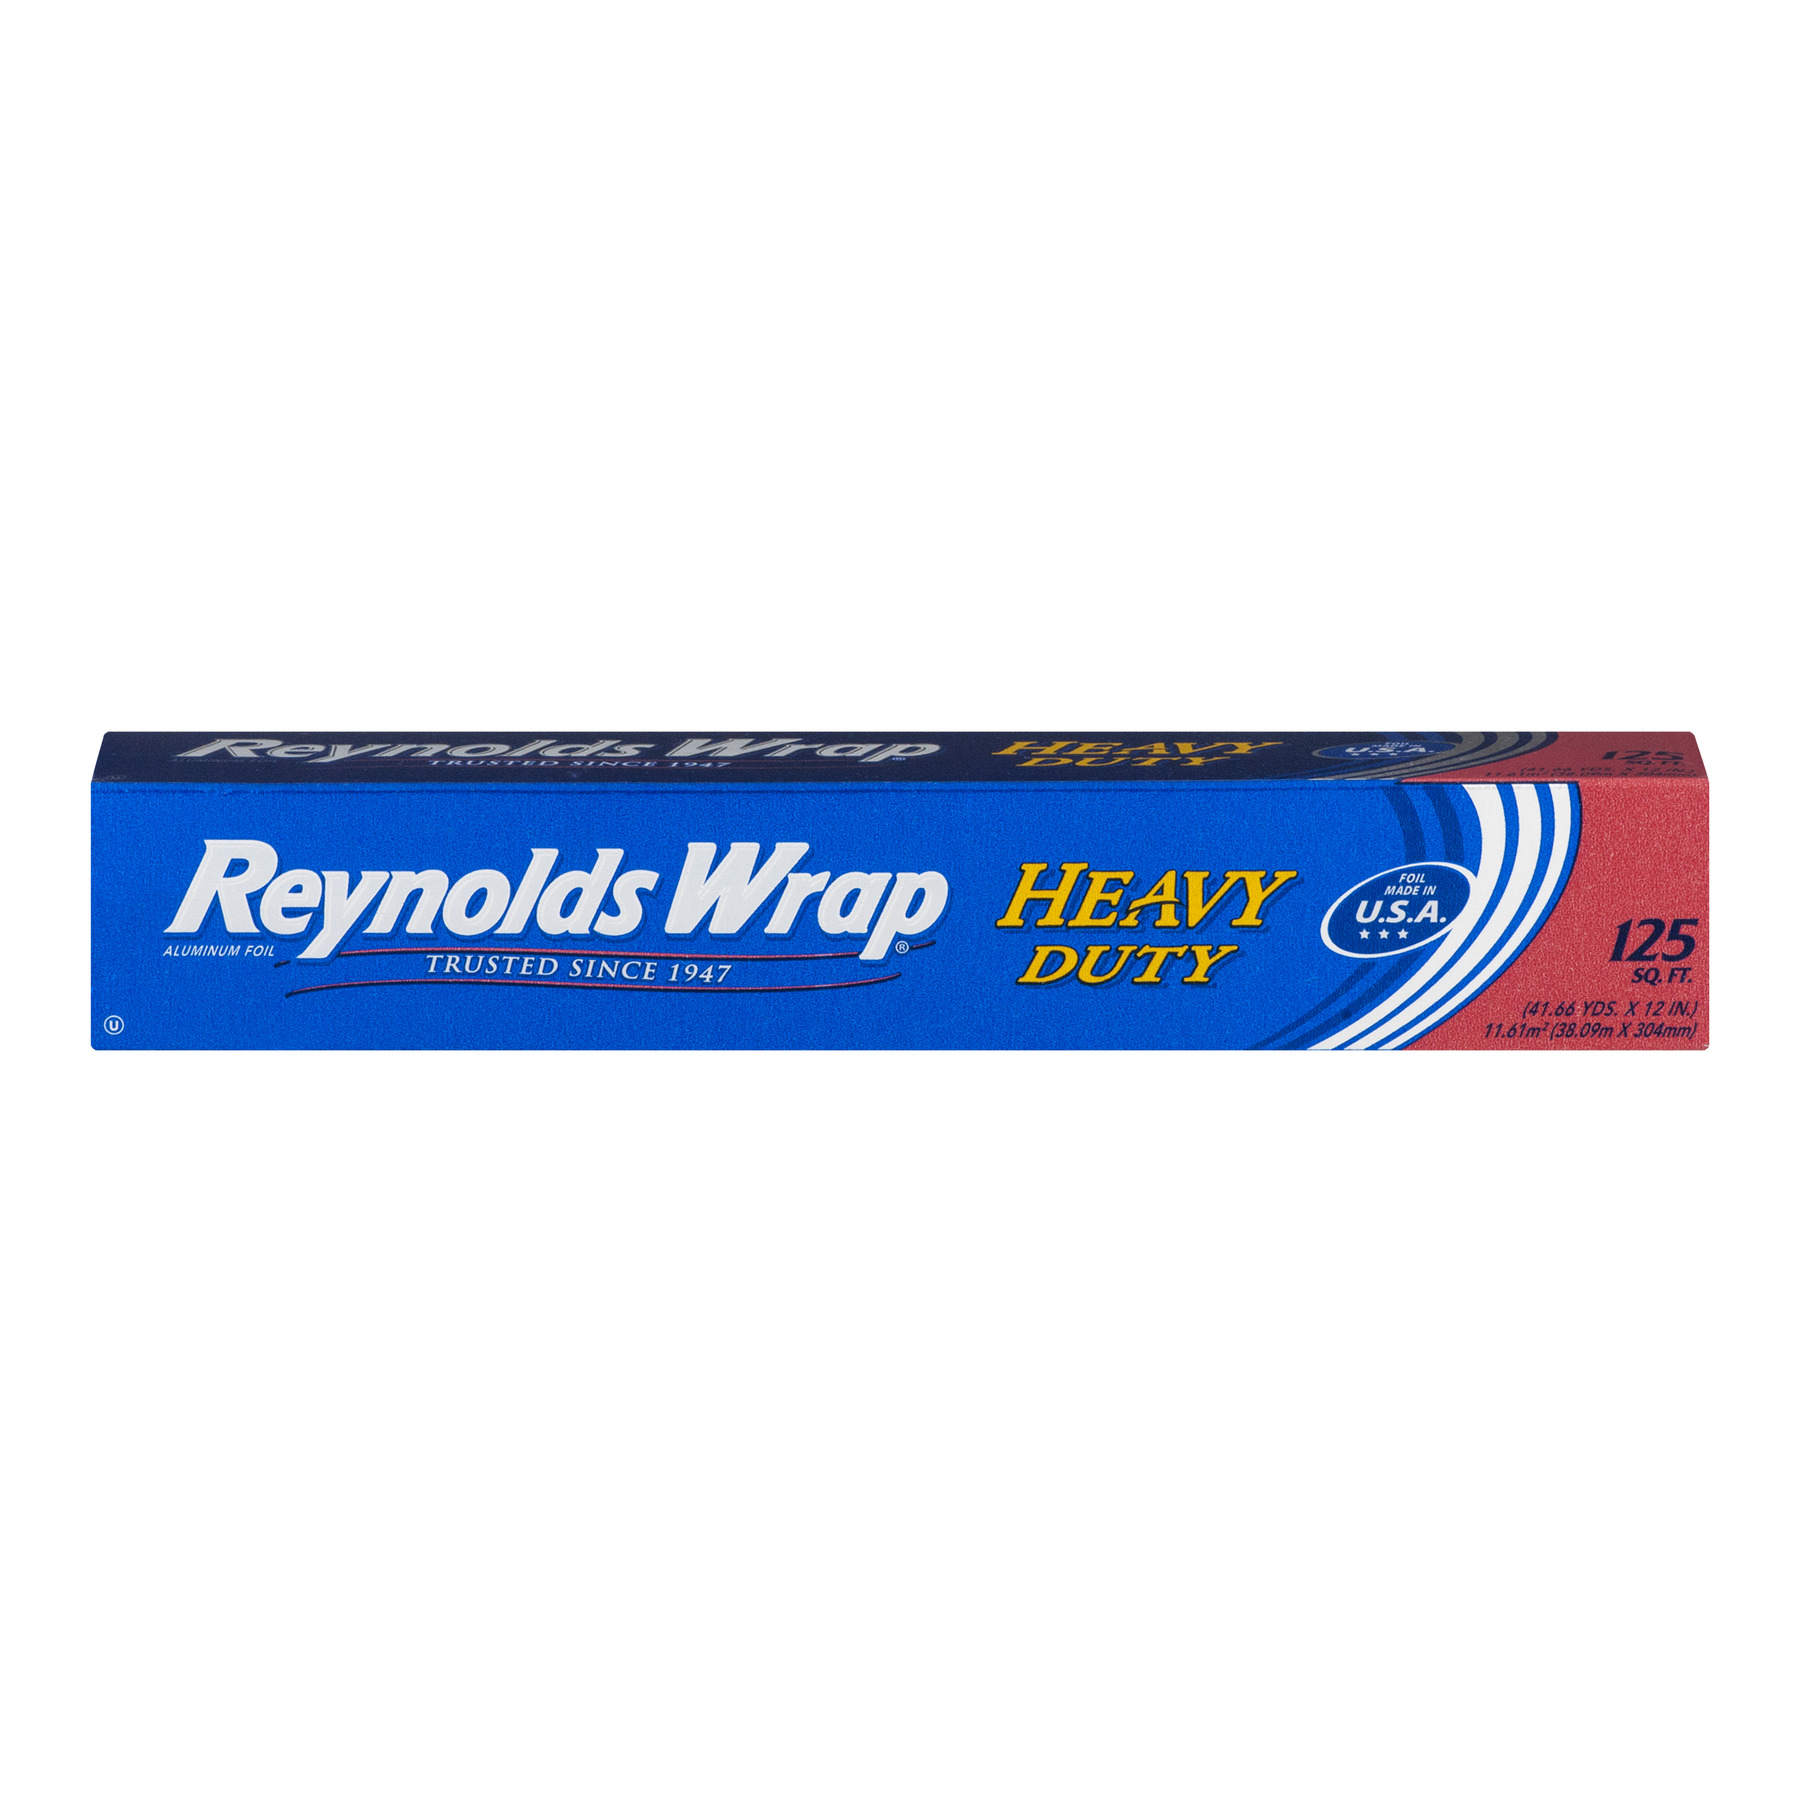 Reynolds Wrap Heavy Duty Aluminum Foil (125 Square Foot Roll)